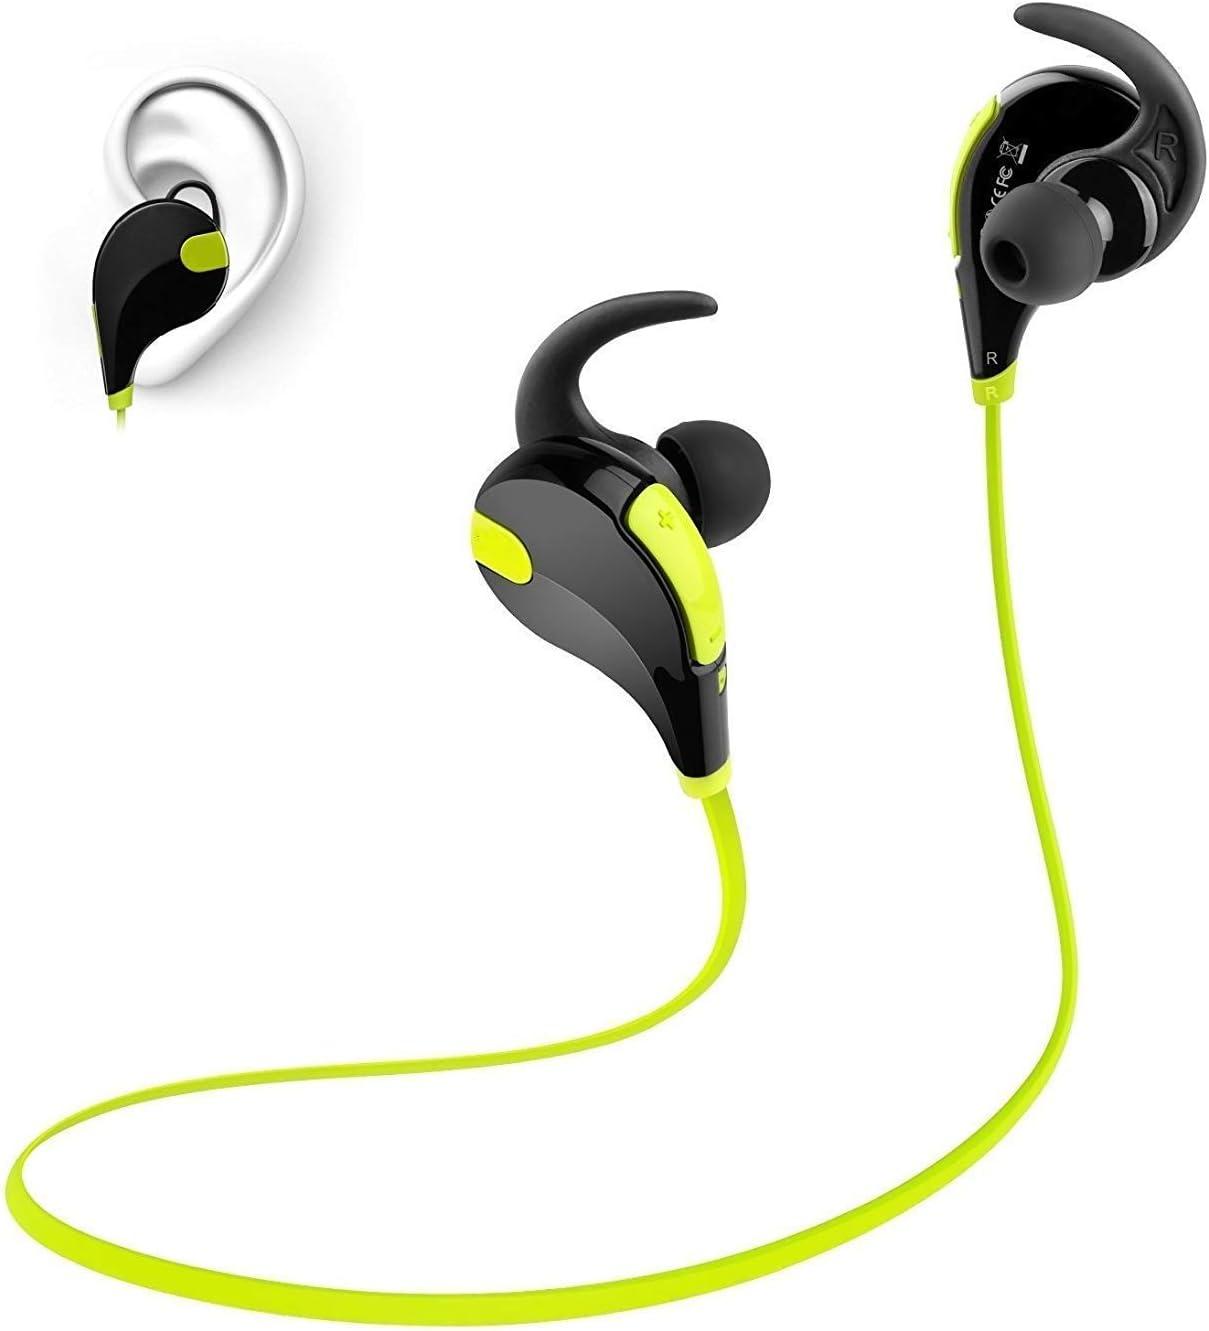 Best Bluetooth Headphones For Running Under 50